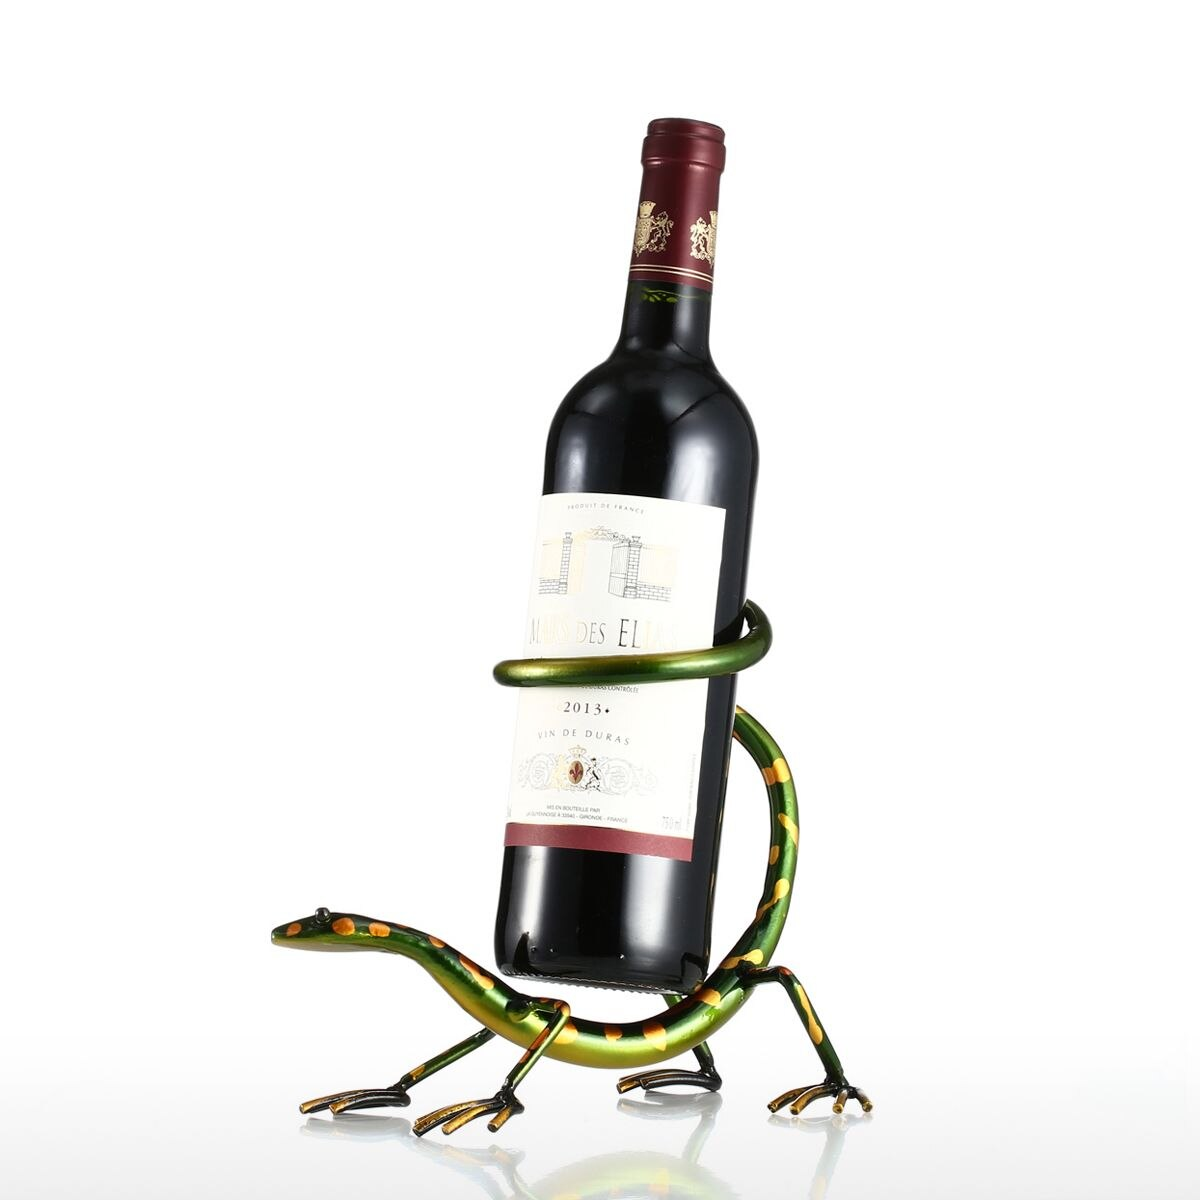 Support bouteille de vin Gecko moderne.